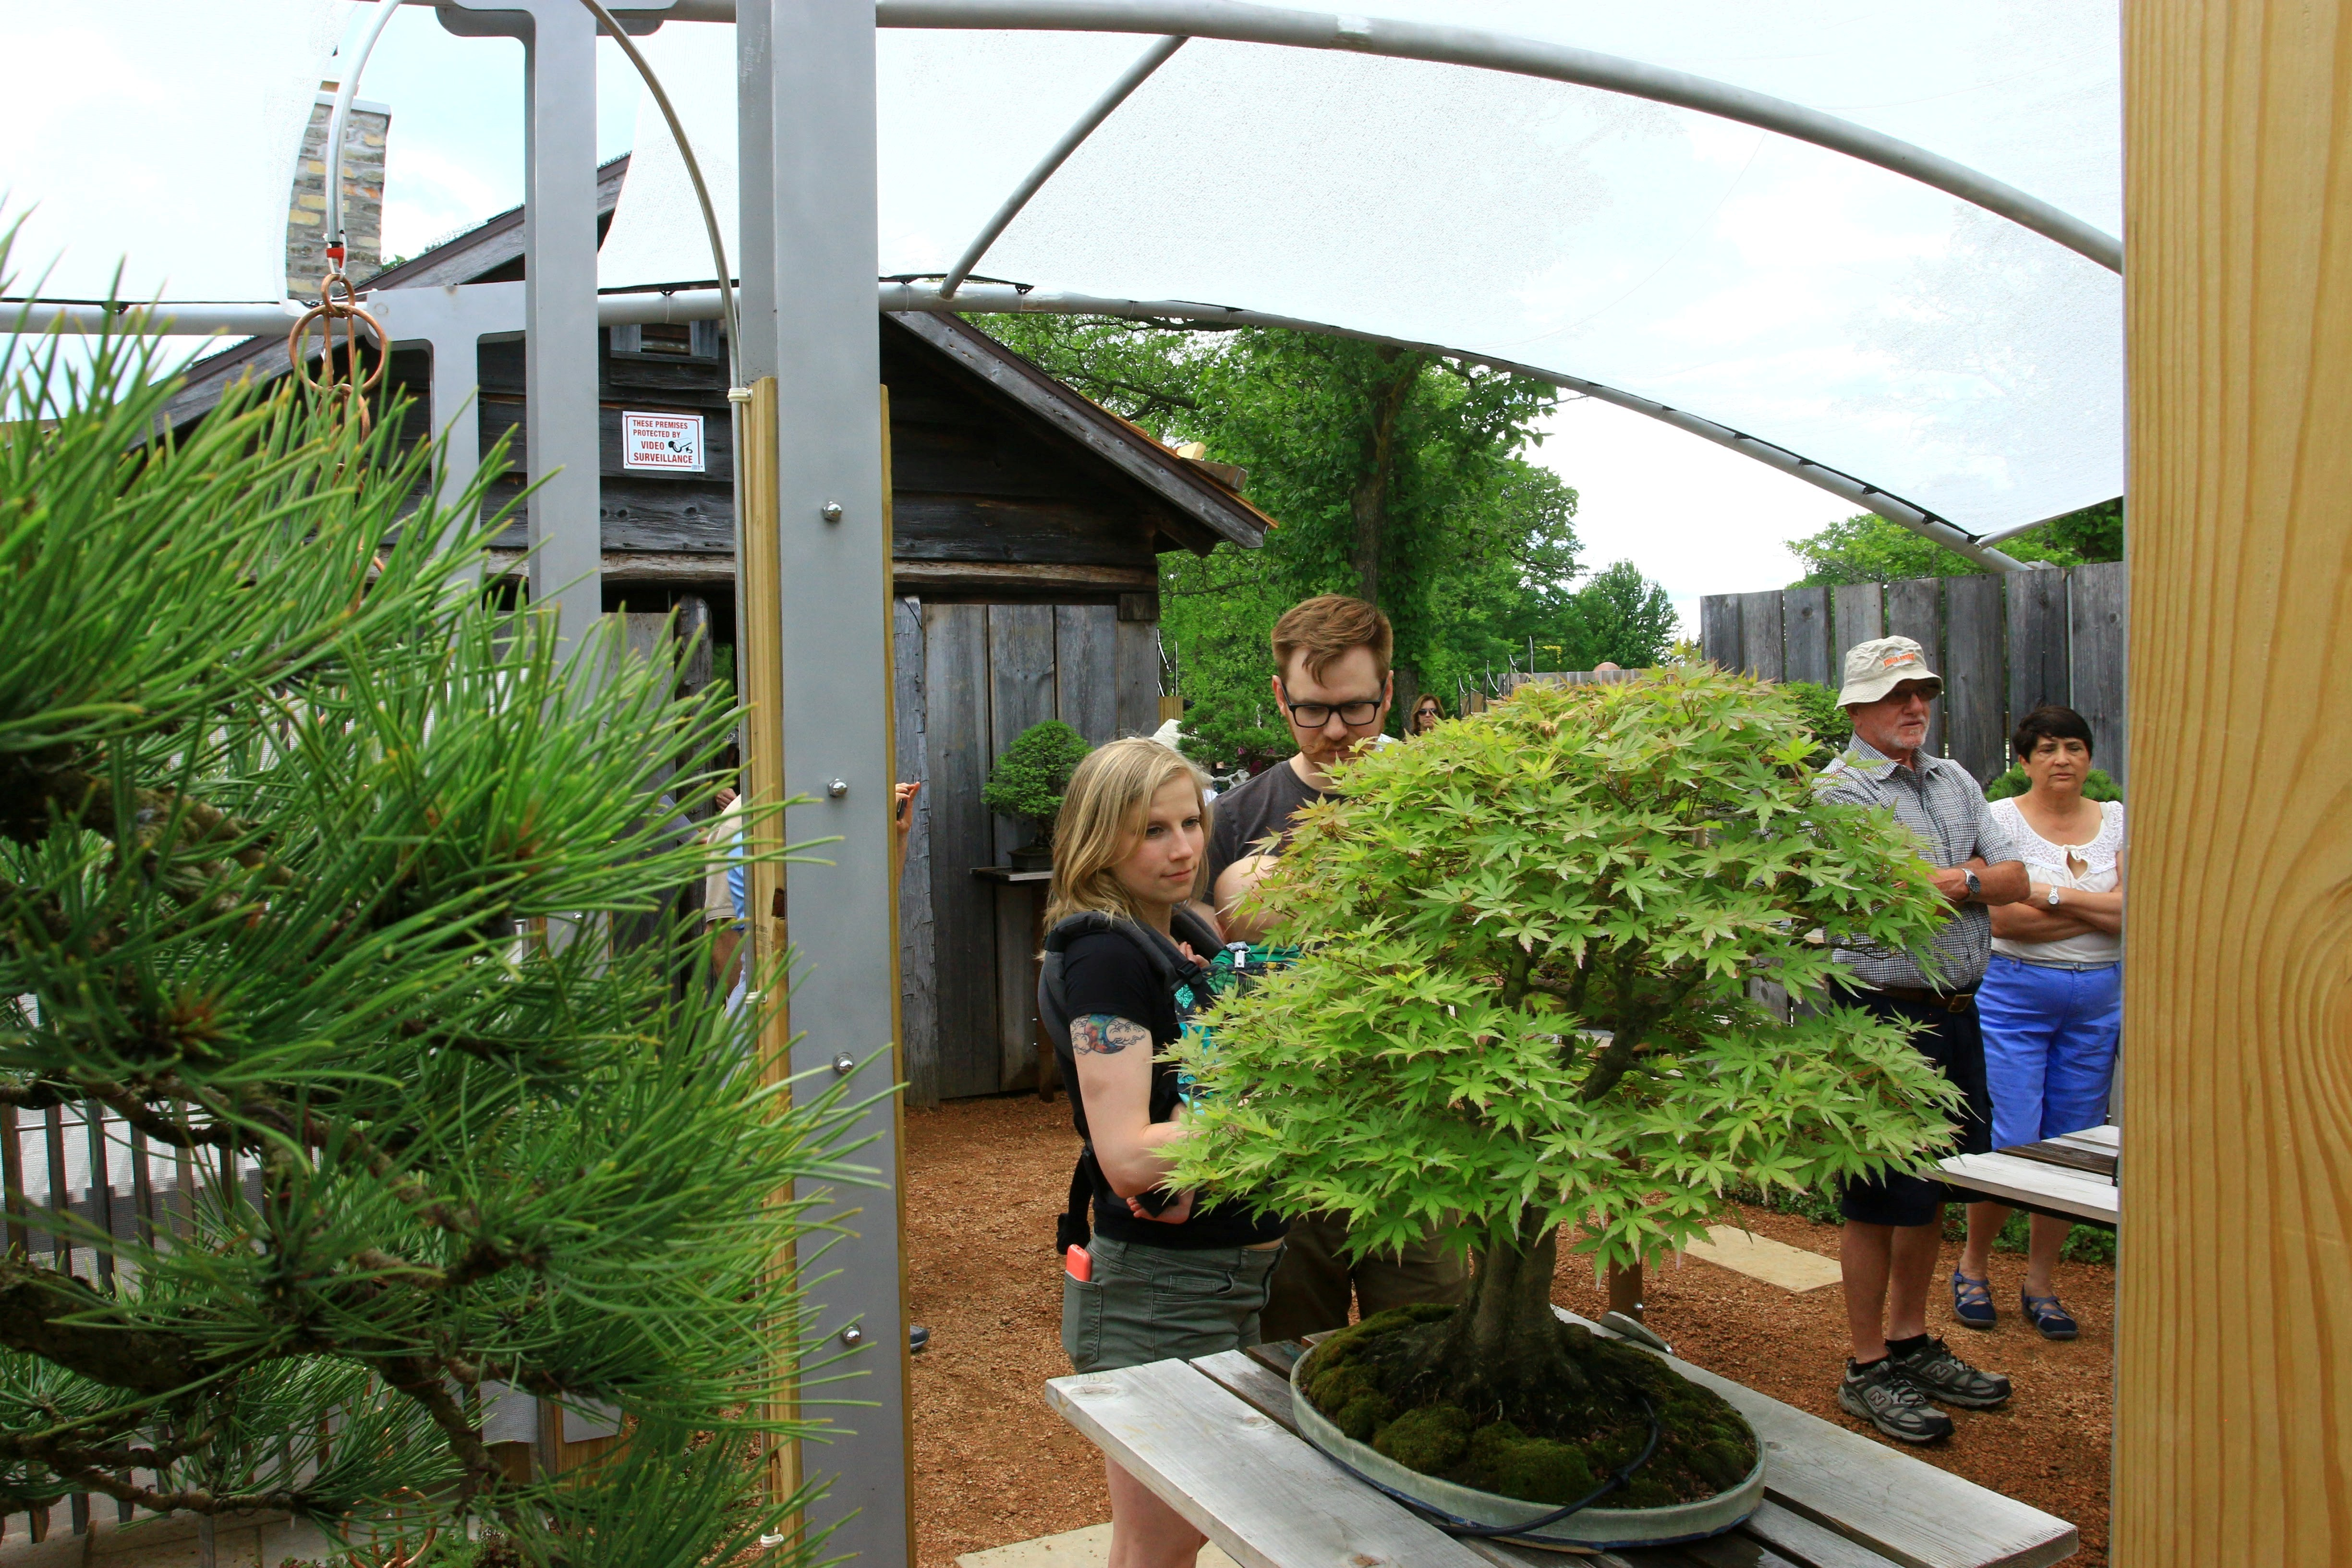 Examining one of the bonsai